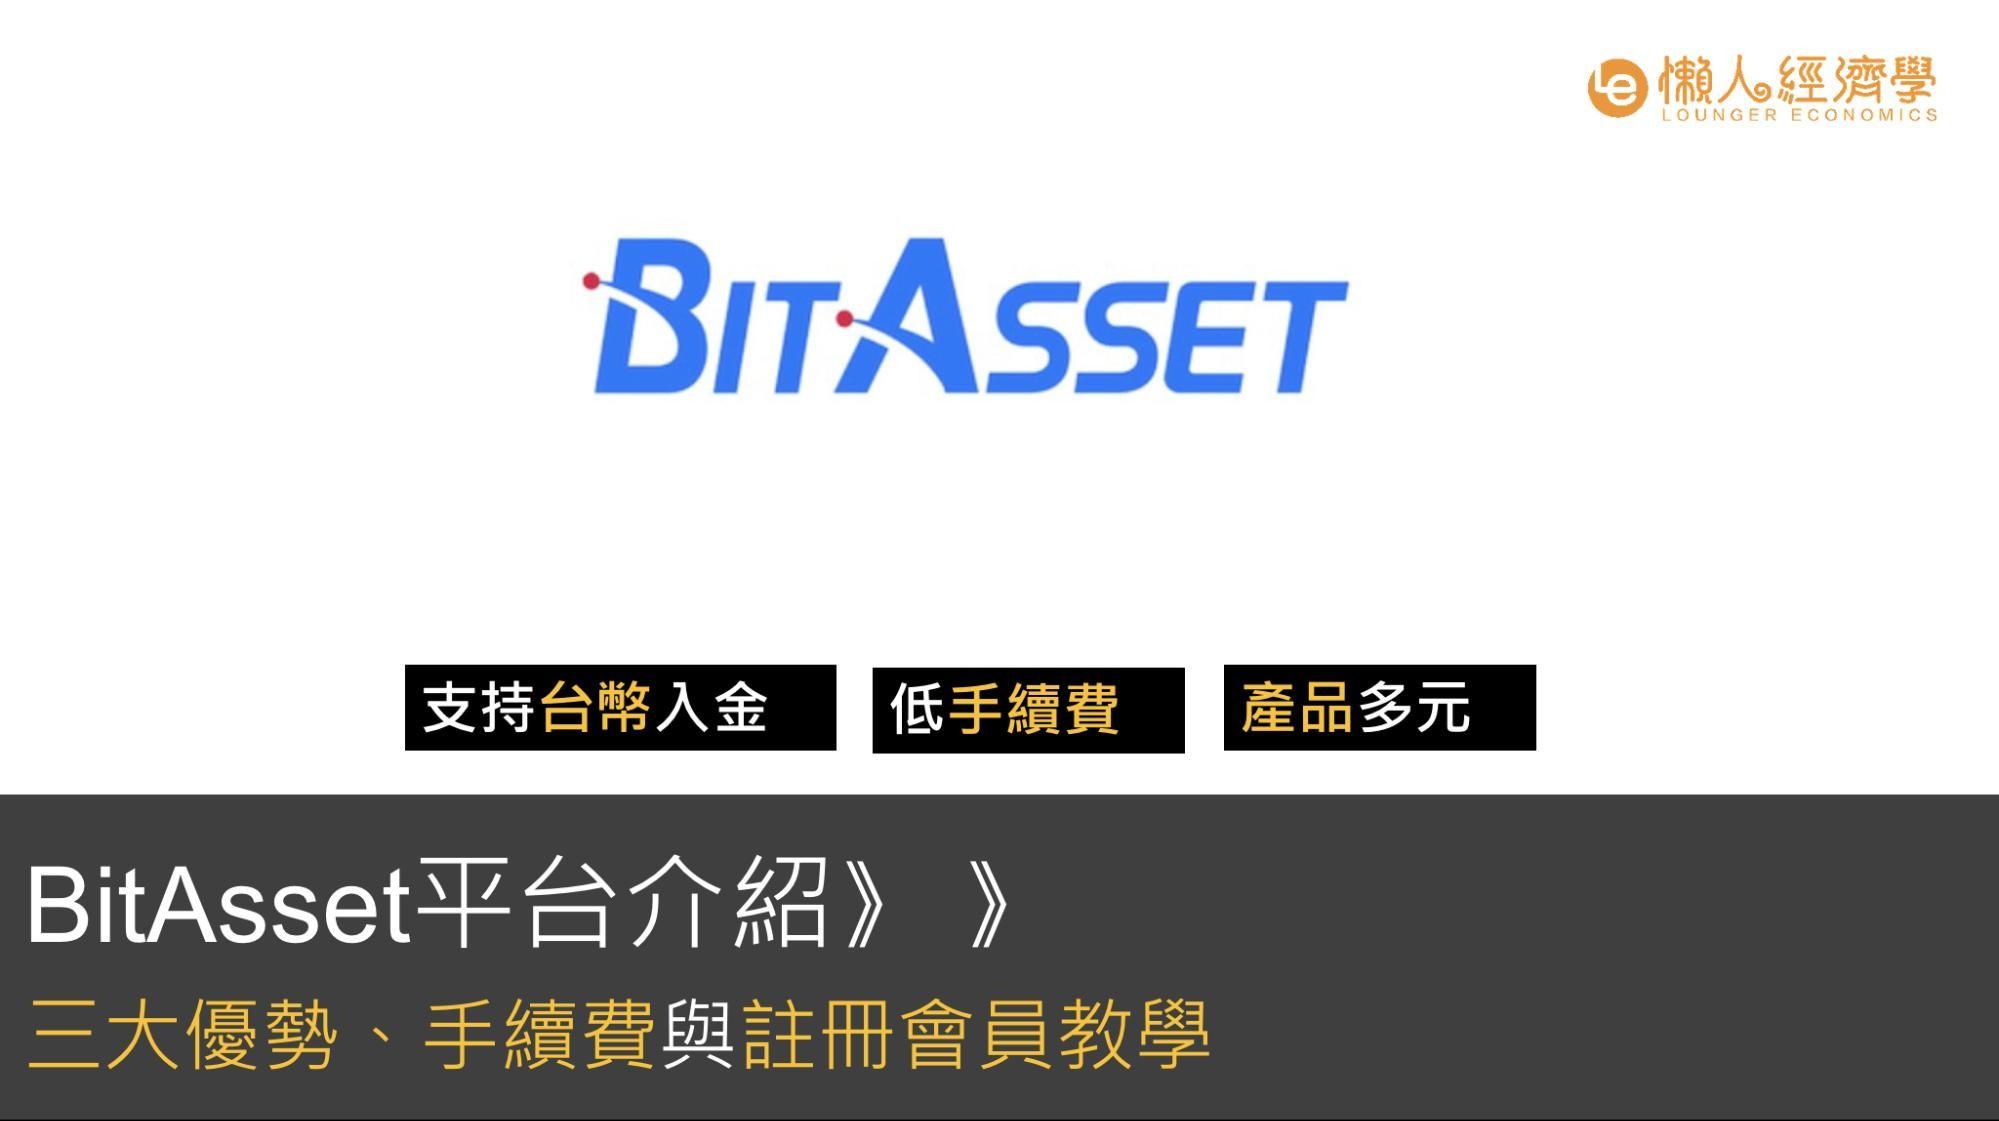 BitAsset平台介紹:三大優勢、手續費、註冊教學教學